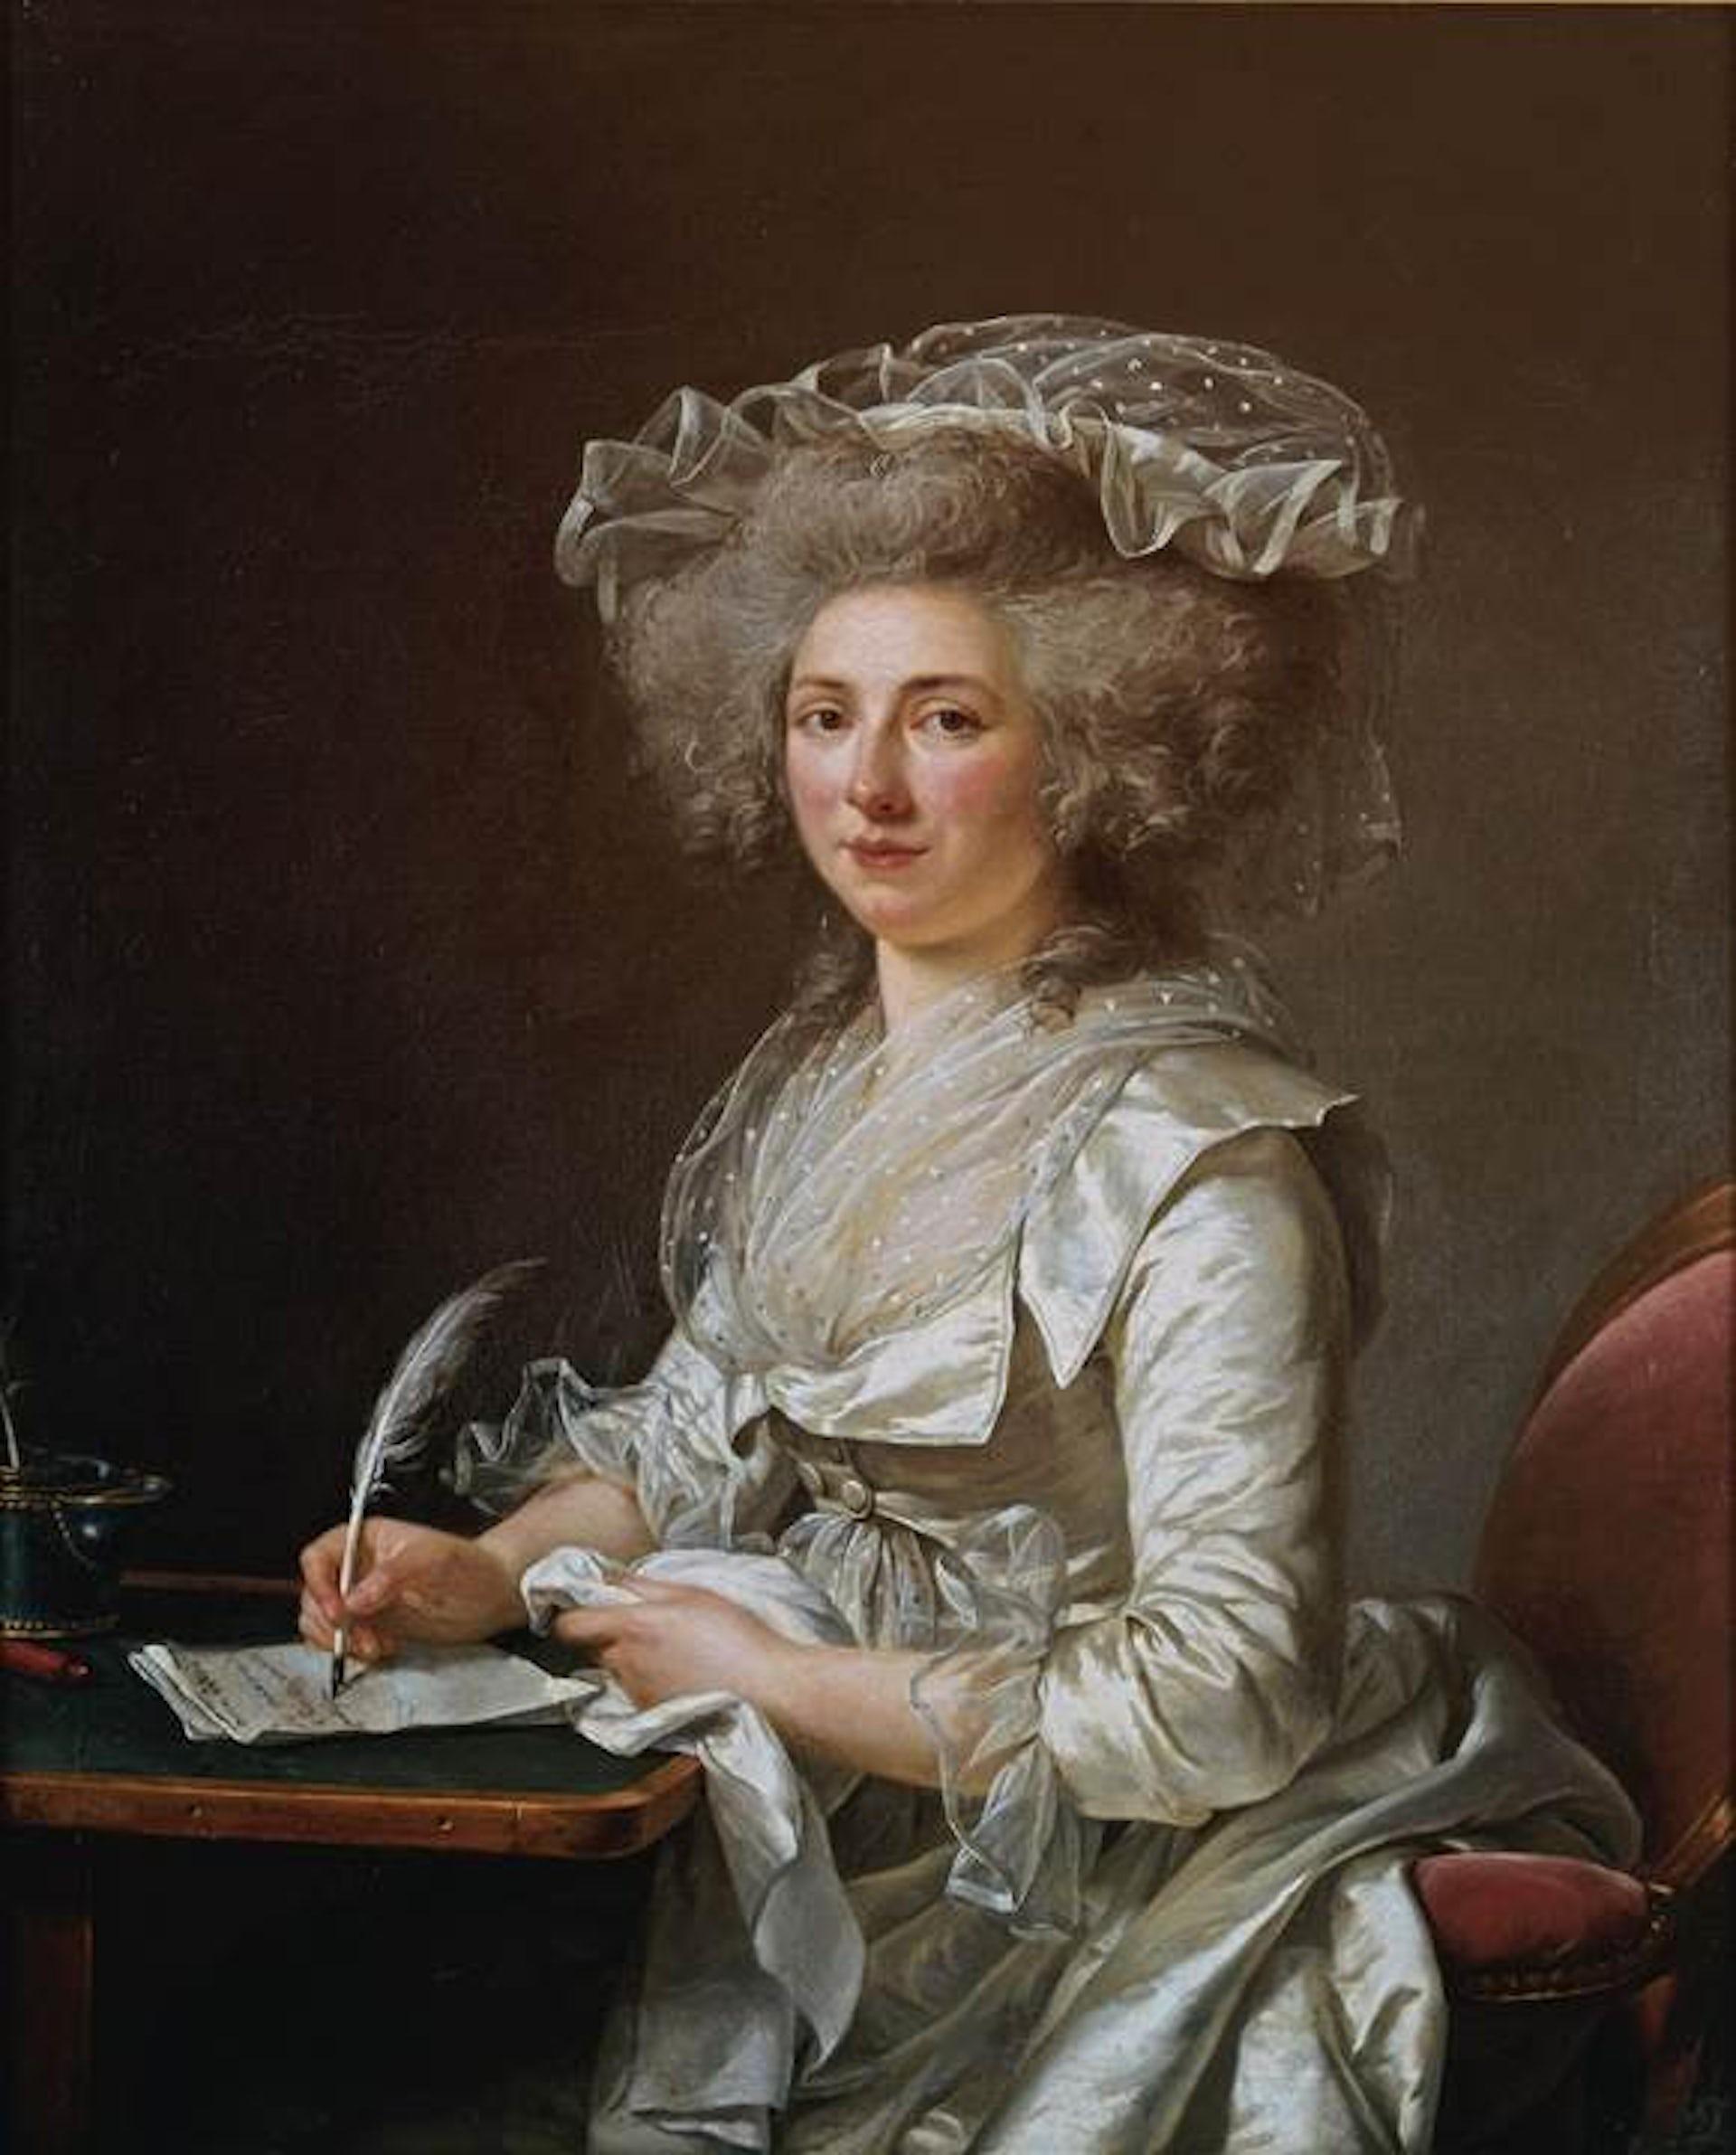 Adélaïde Labille-Guiard, prodigiously talented painter